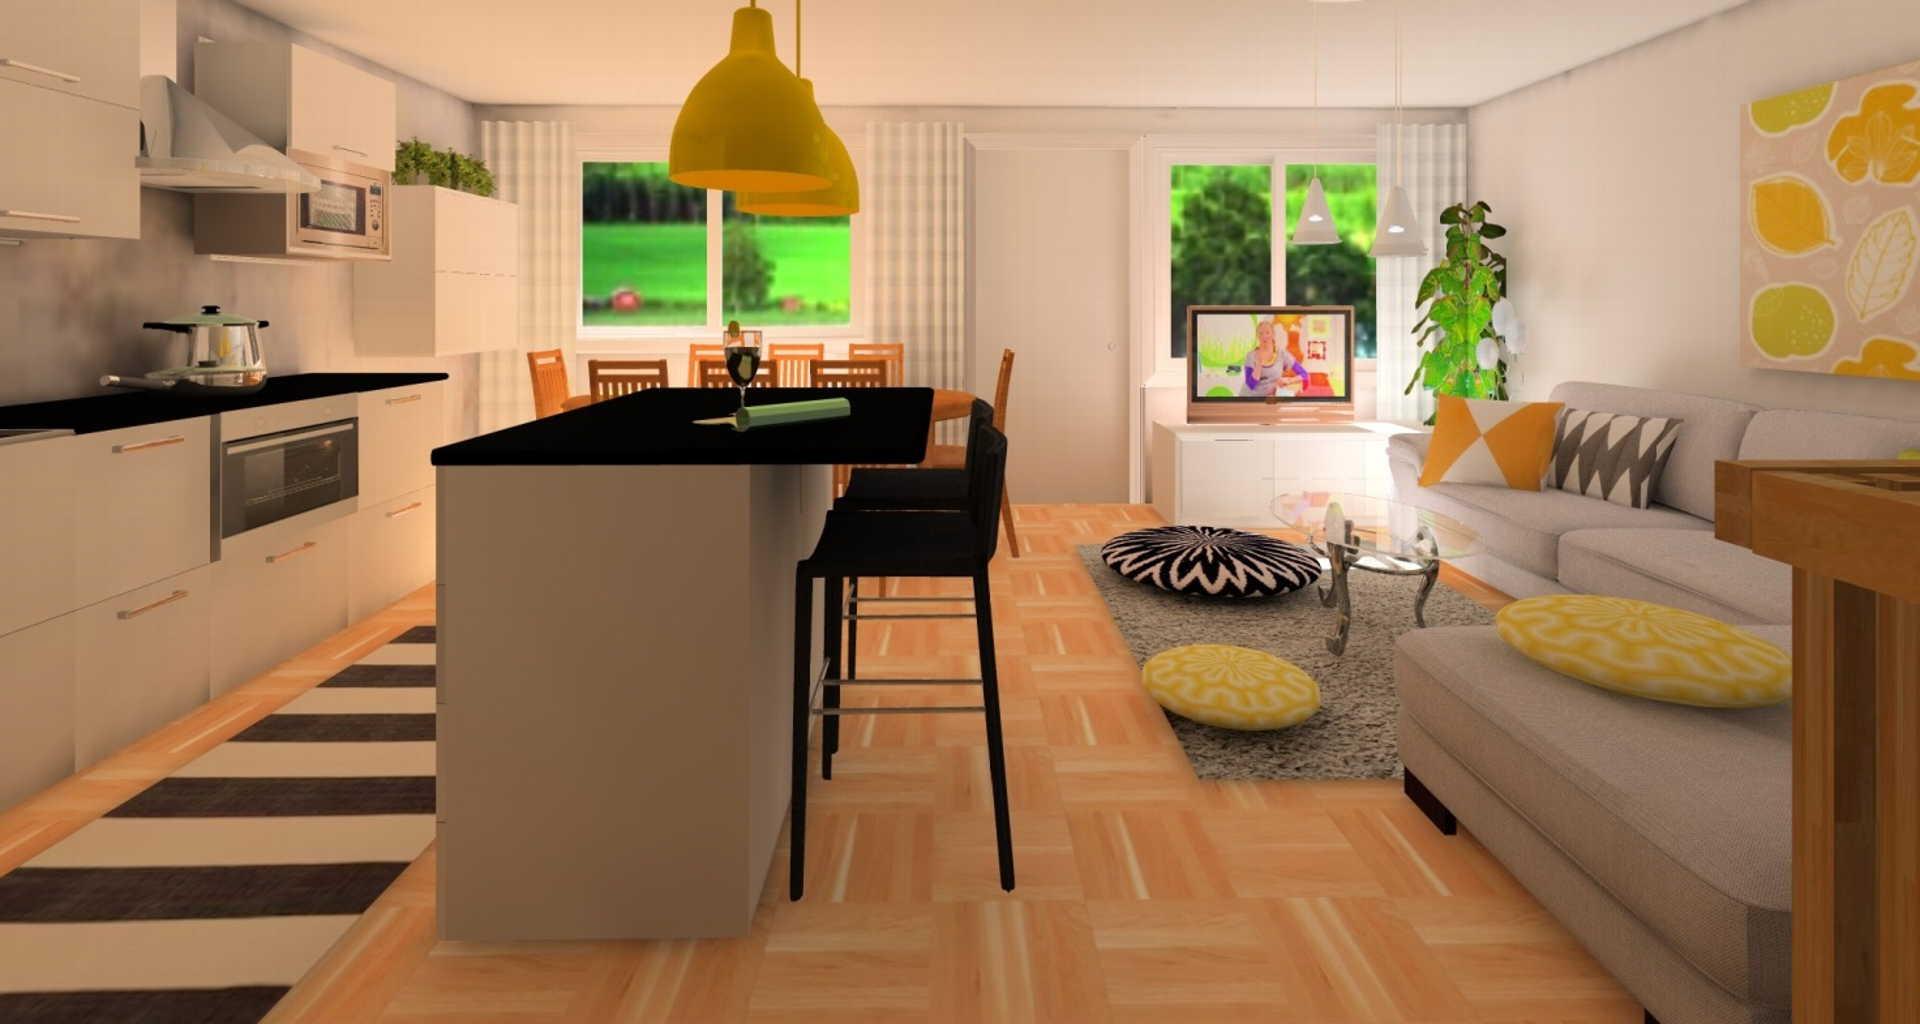 Moderni olohuone, Sisustus  olohuone  keittiö